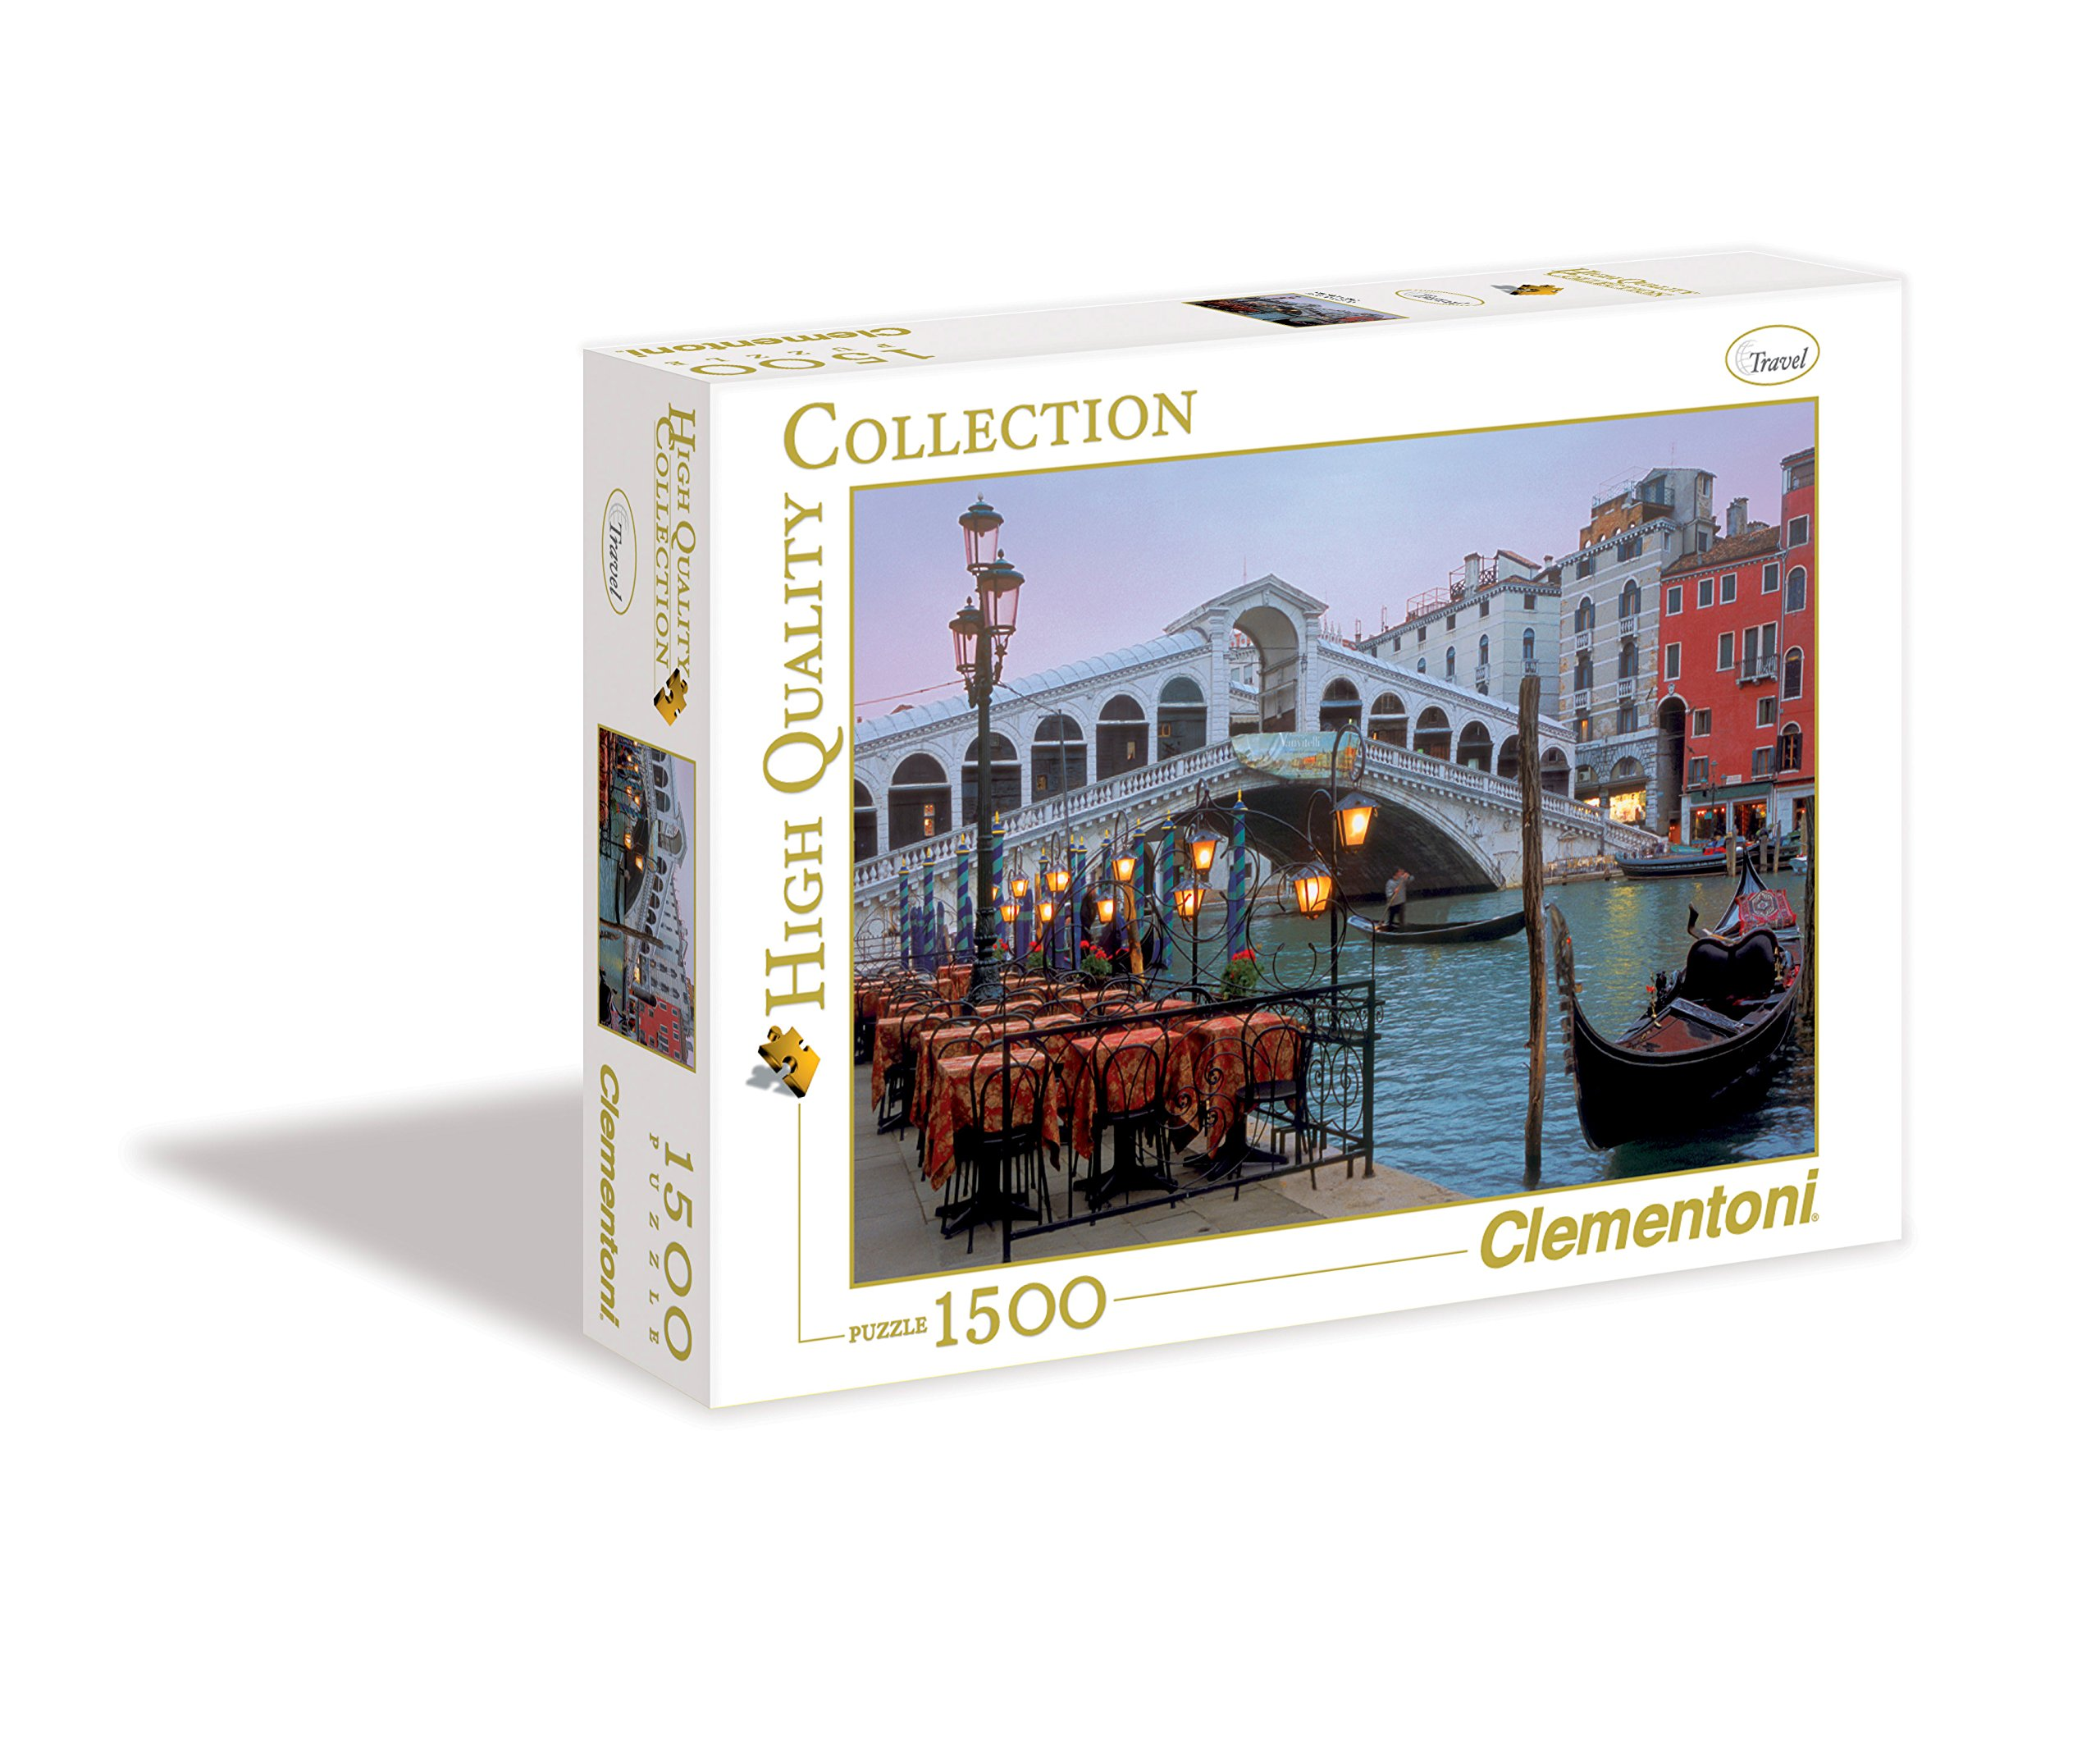 Venice, 1500 Piece Jigsaw Puzzle by Clementoni